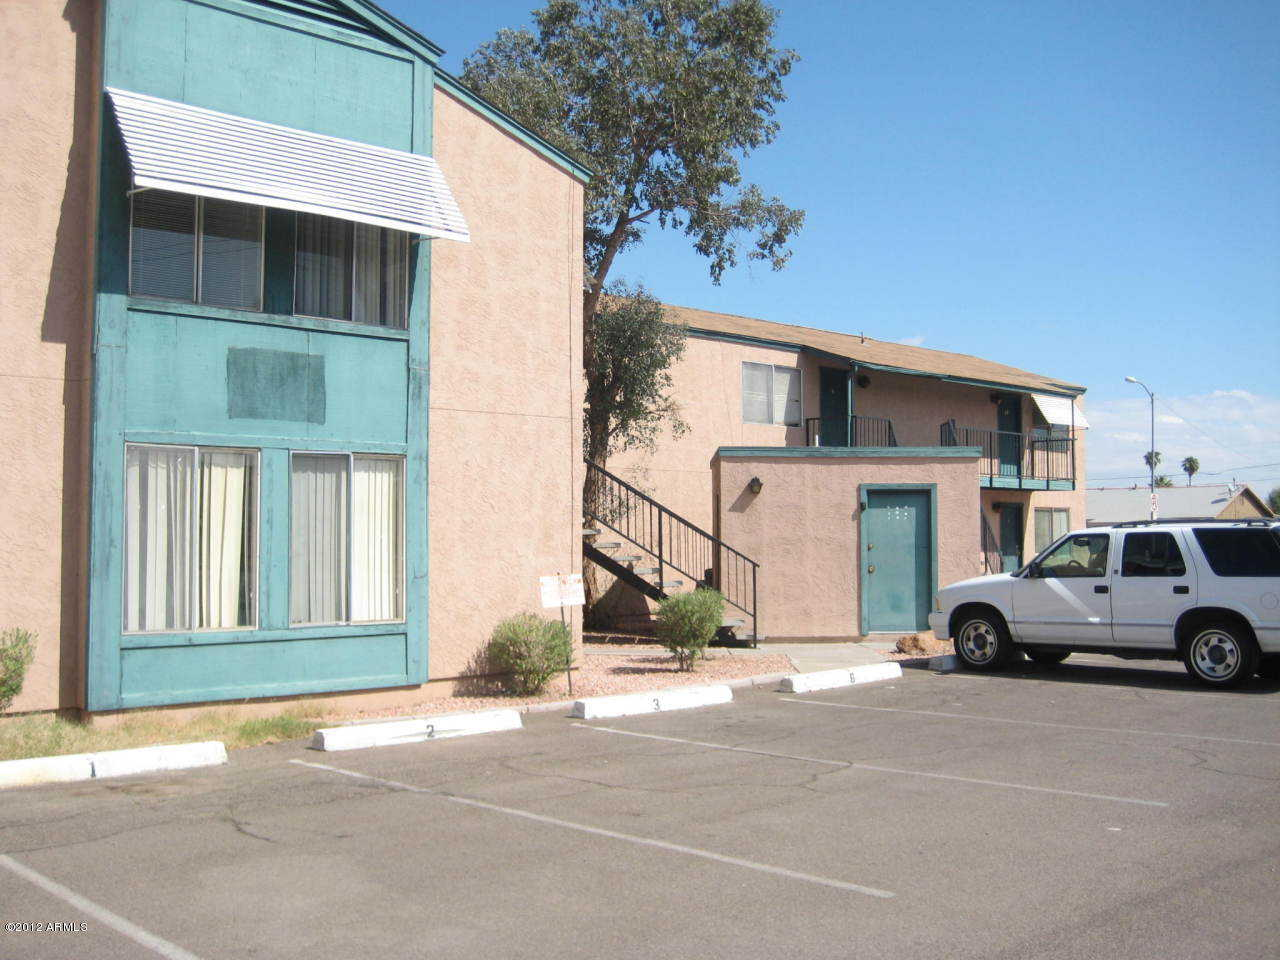 - 1Br/1Ba - Condo for Sale in Elsinore, Phoenix